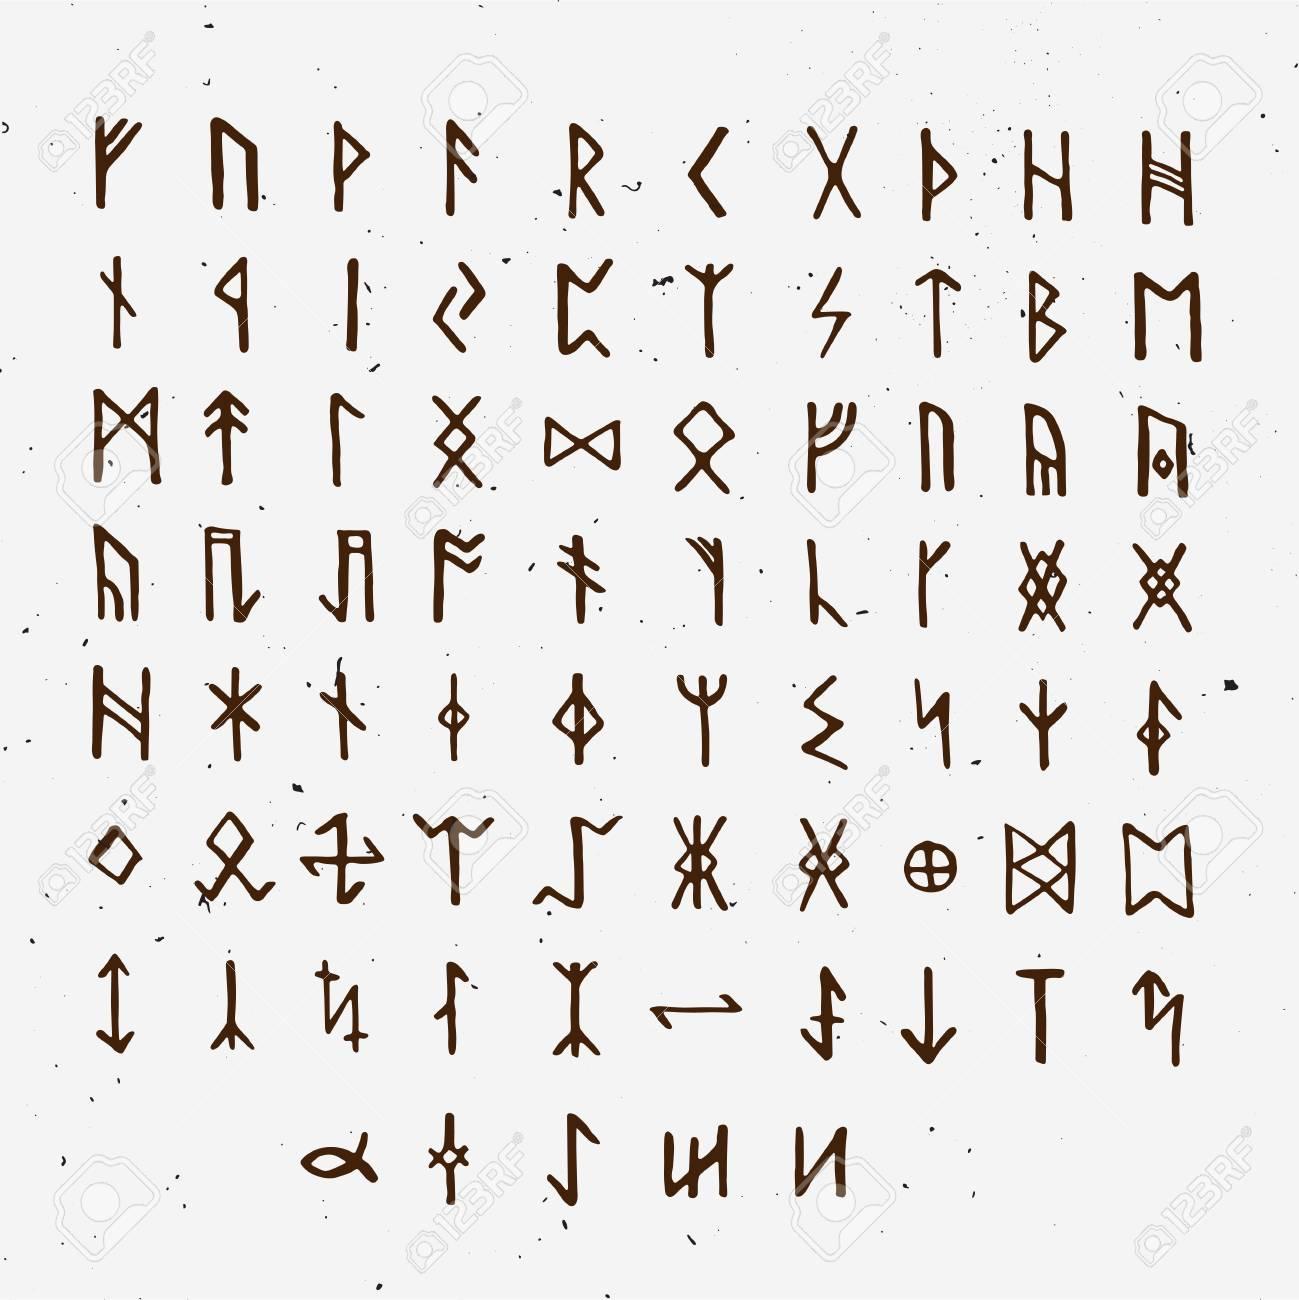 82 Ancient Writing Symbols Ancient Cave Writing Symbols Stock